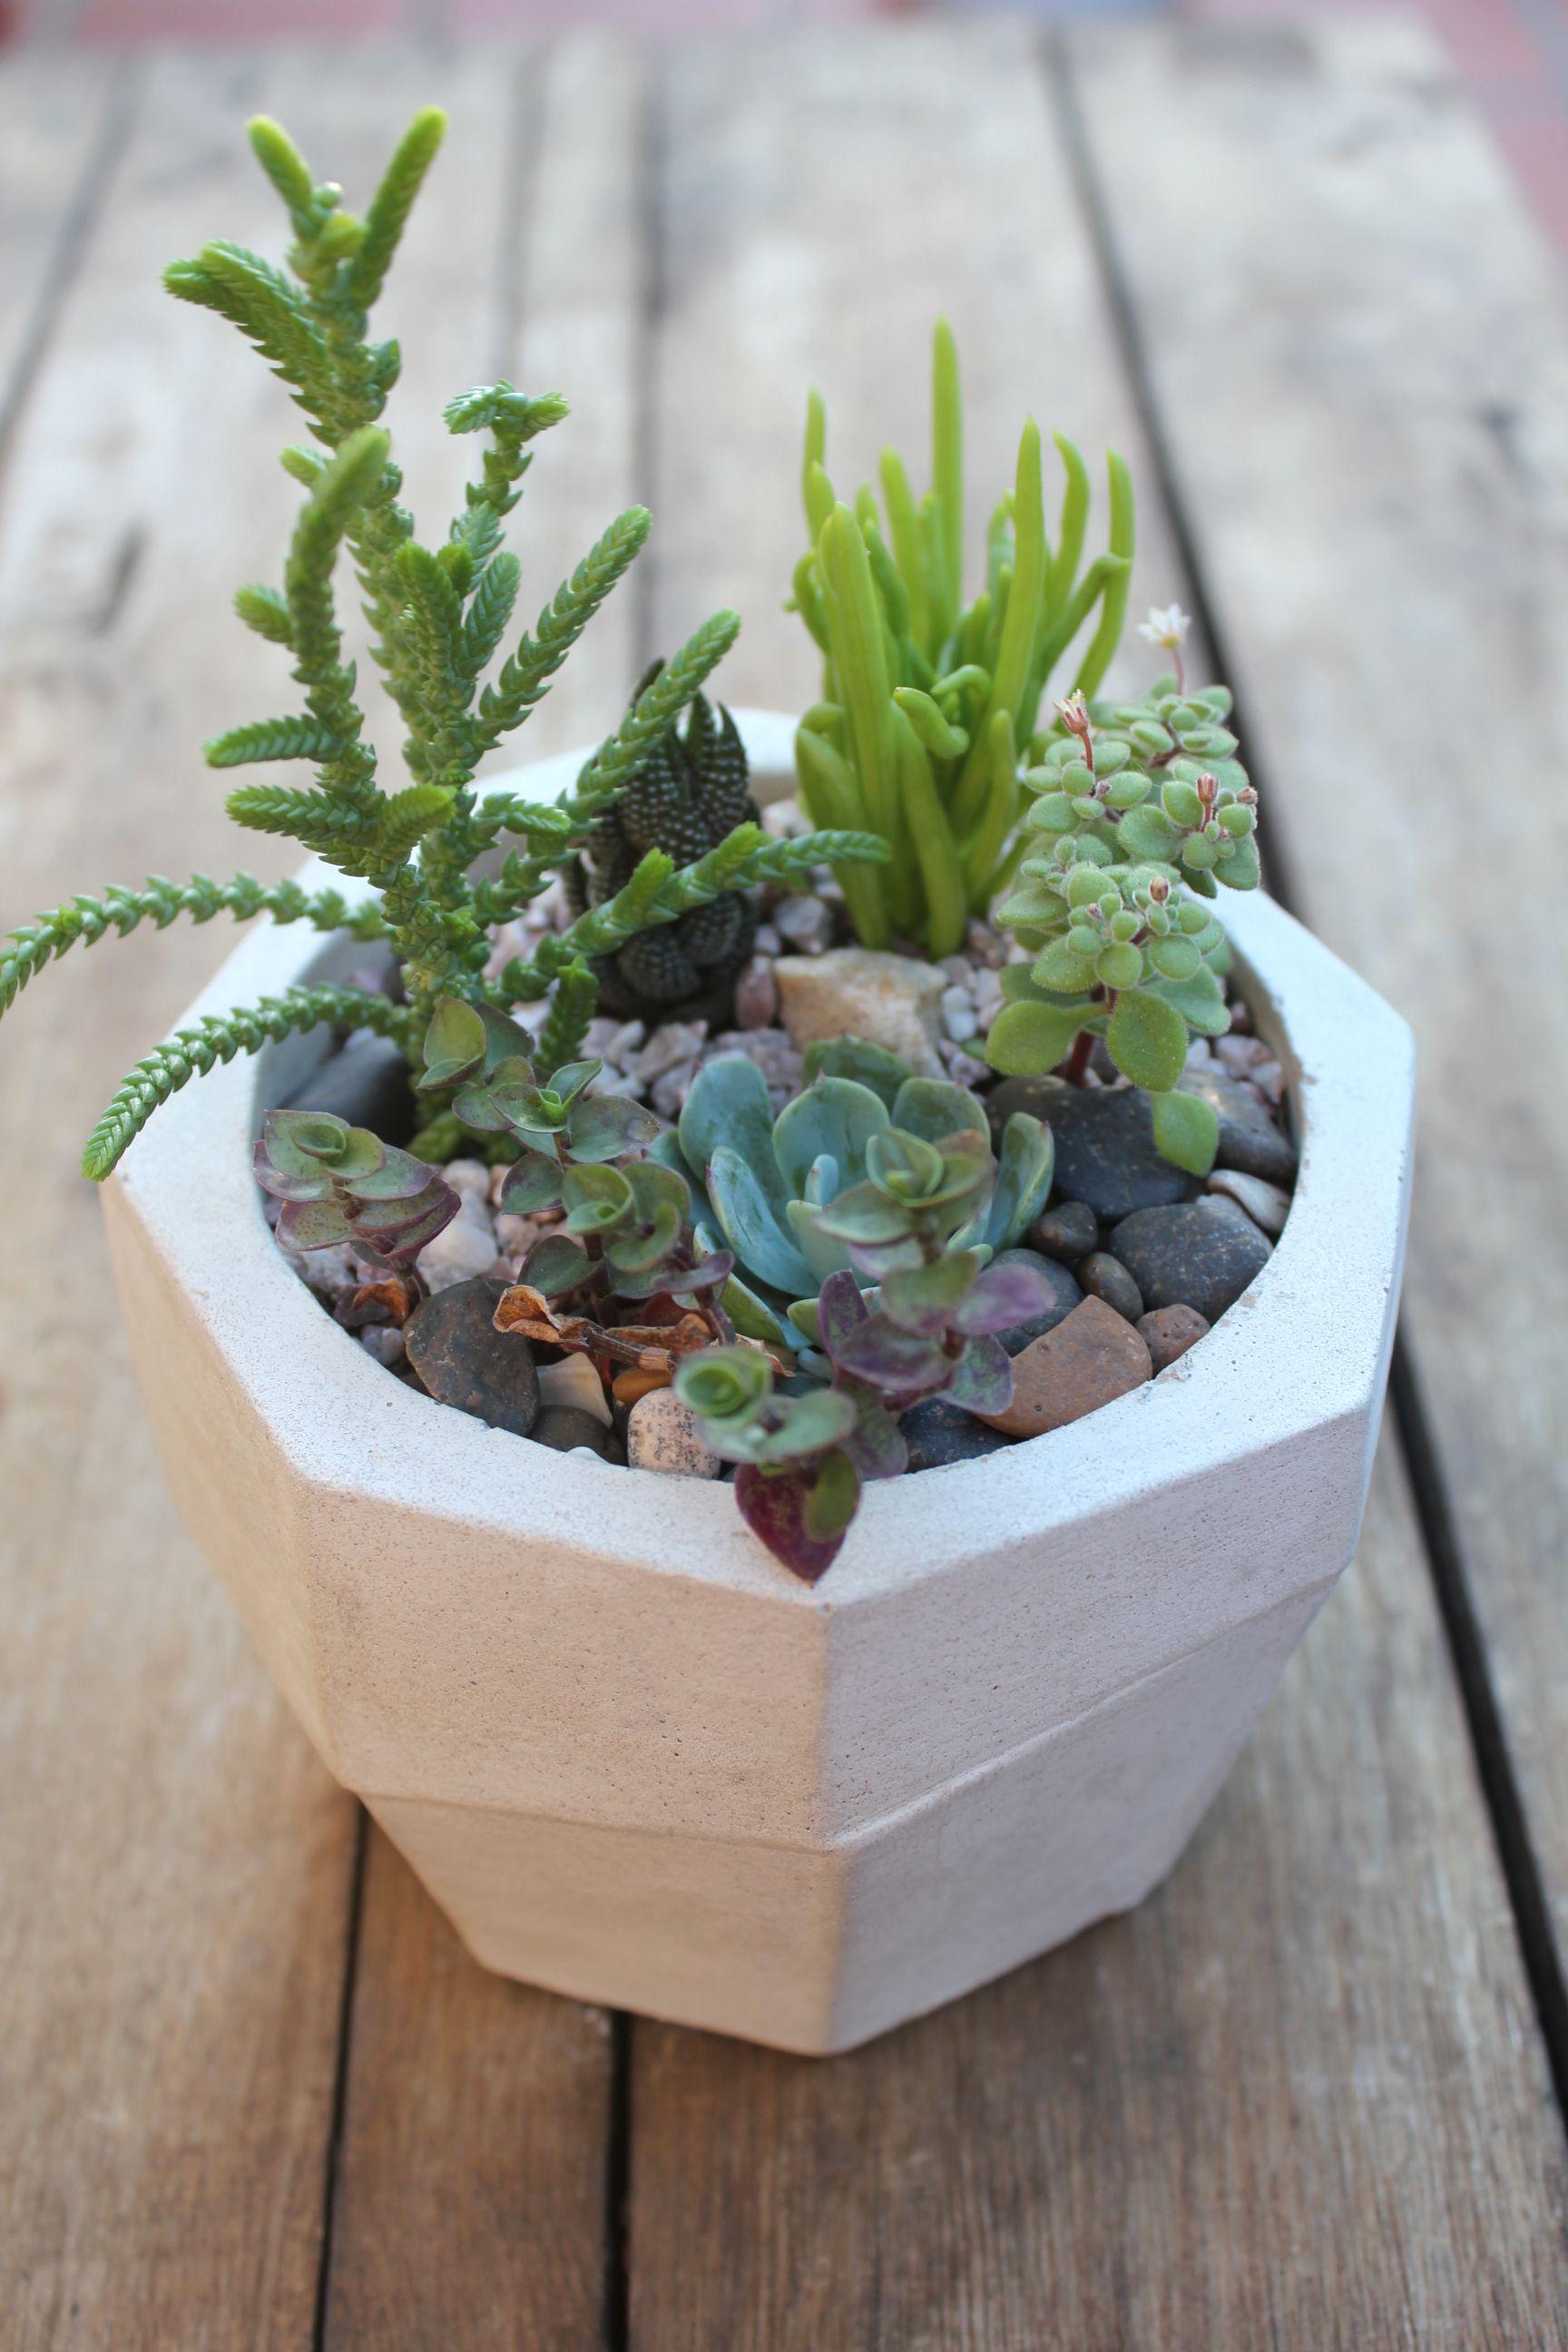 Maceta cemento cactus terrario jardin macetas for Macetas para jardines pequenos